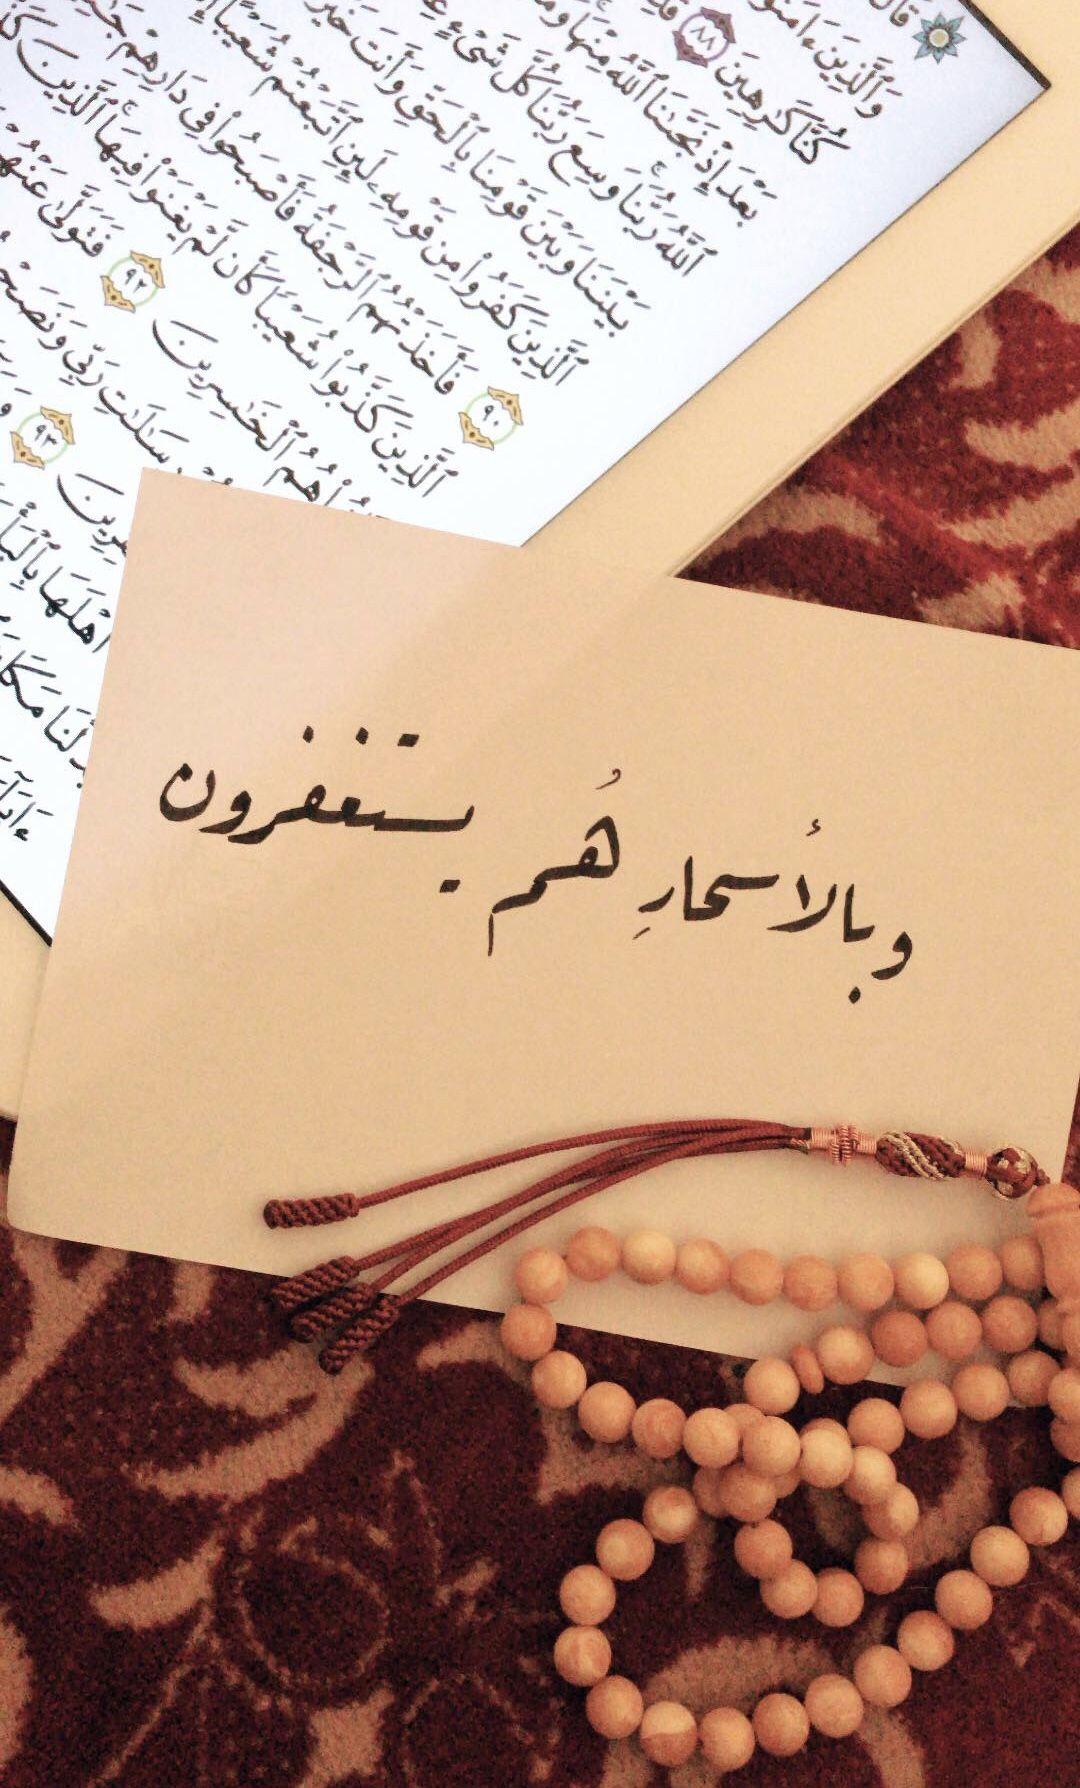 رمضان الليالي العشر استغفار خط خطي رقعة استغفرالله Cinnamon Sticks Spices Stick